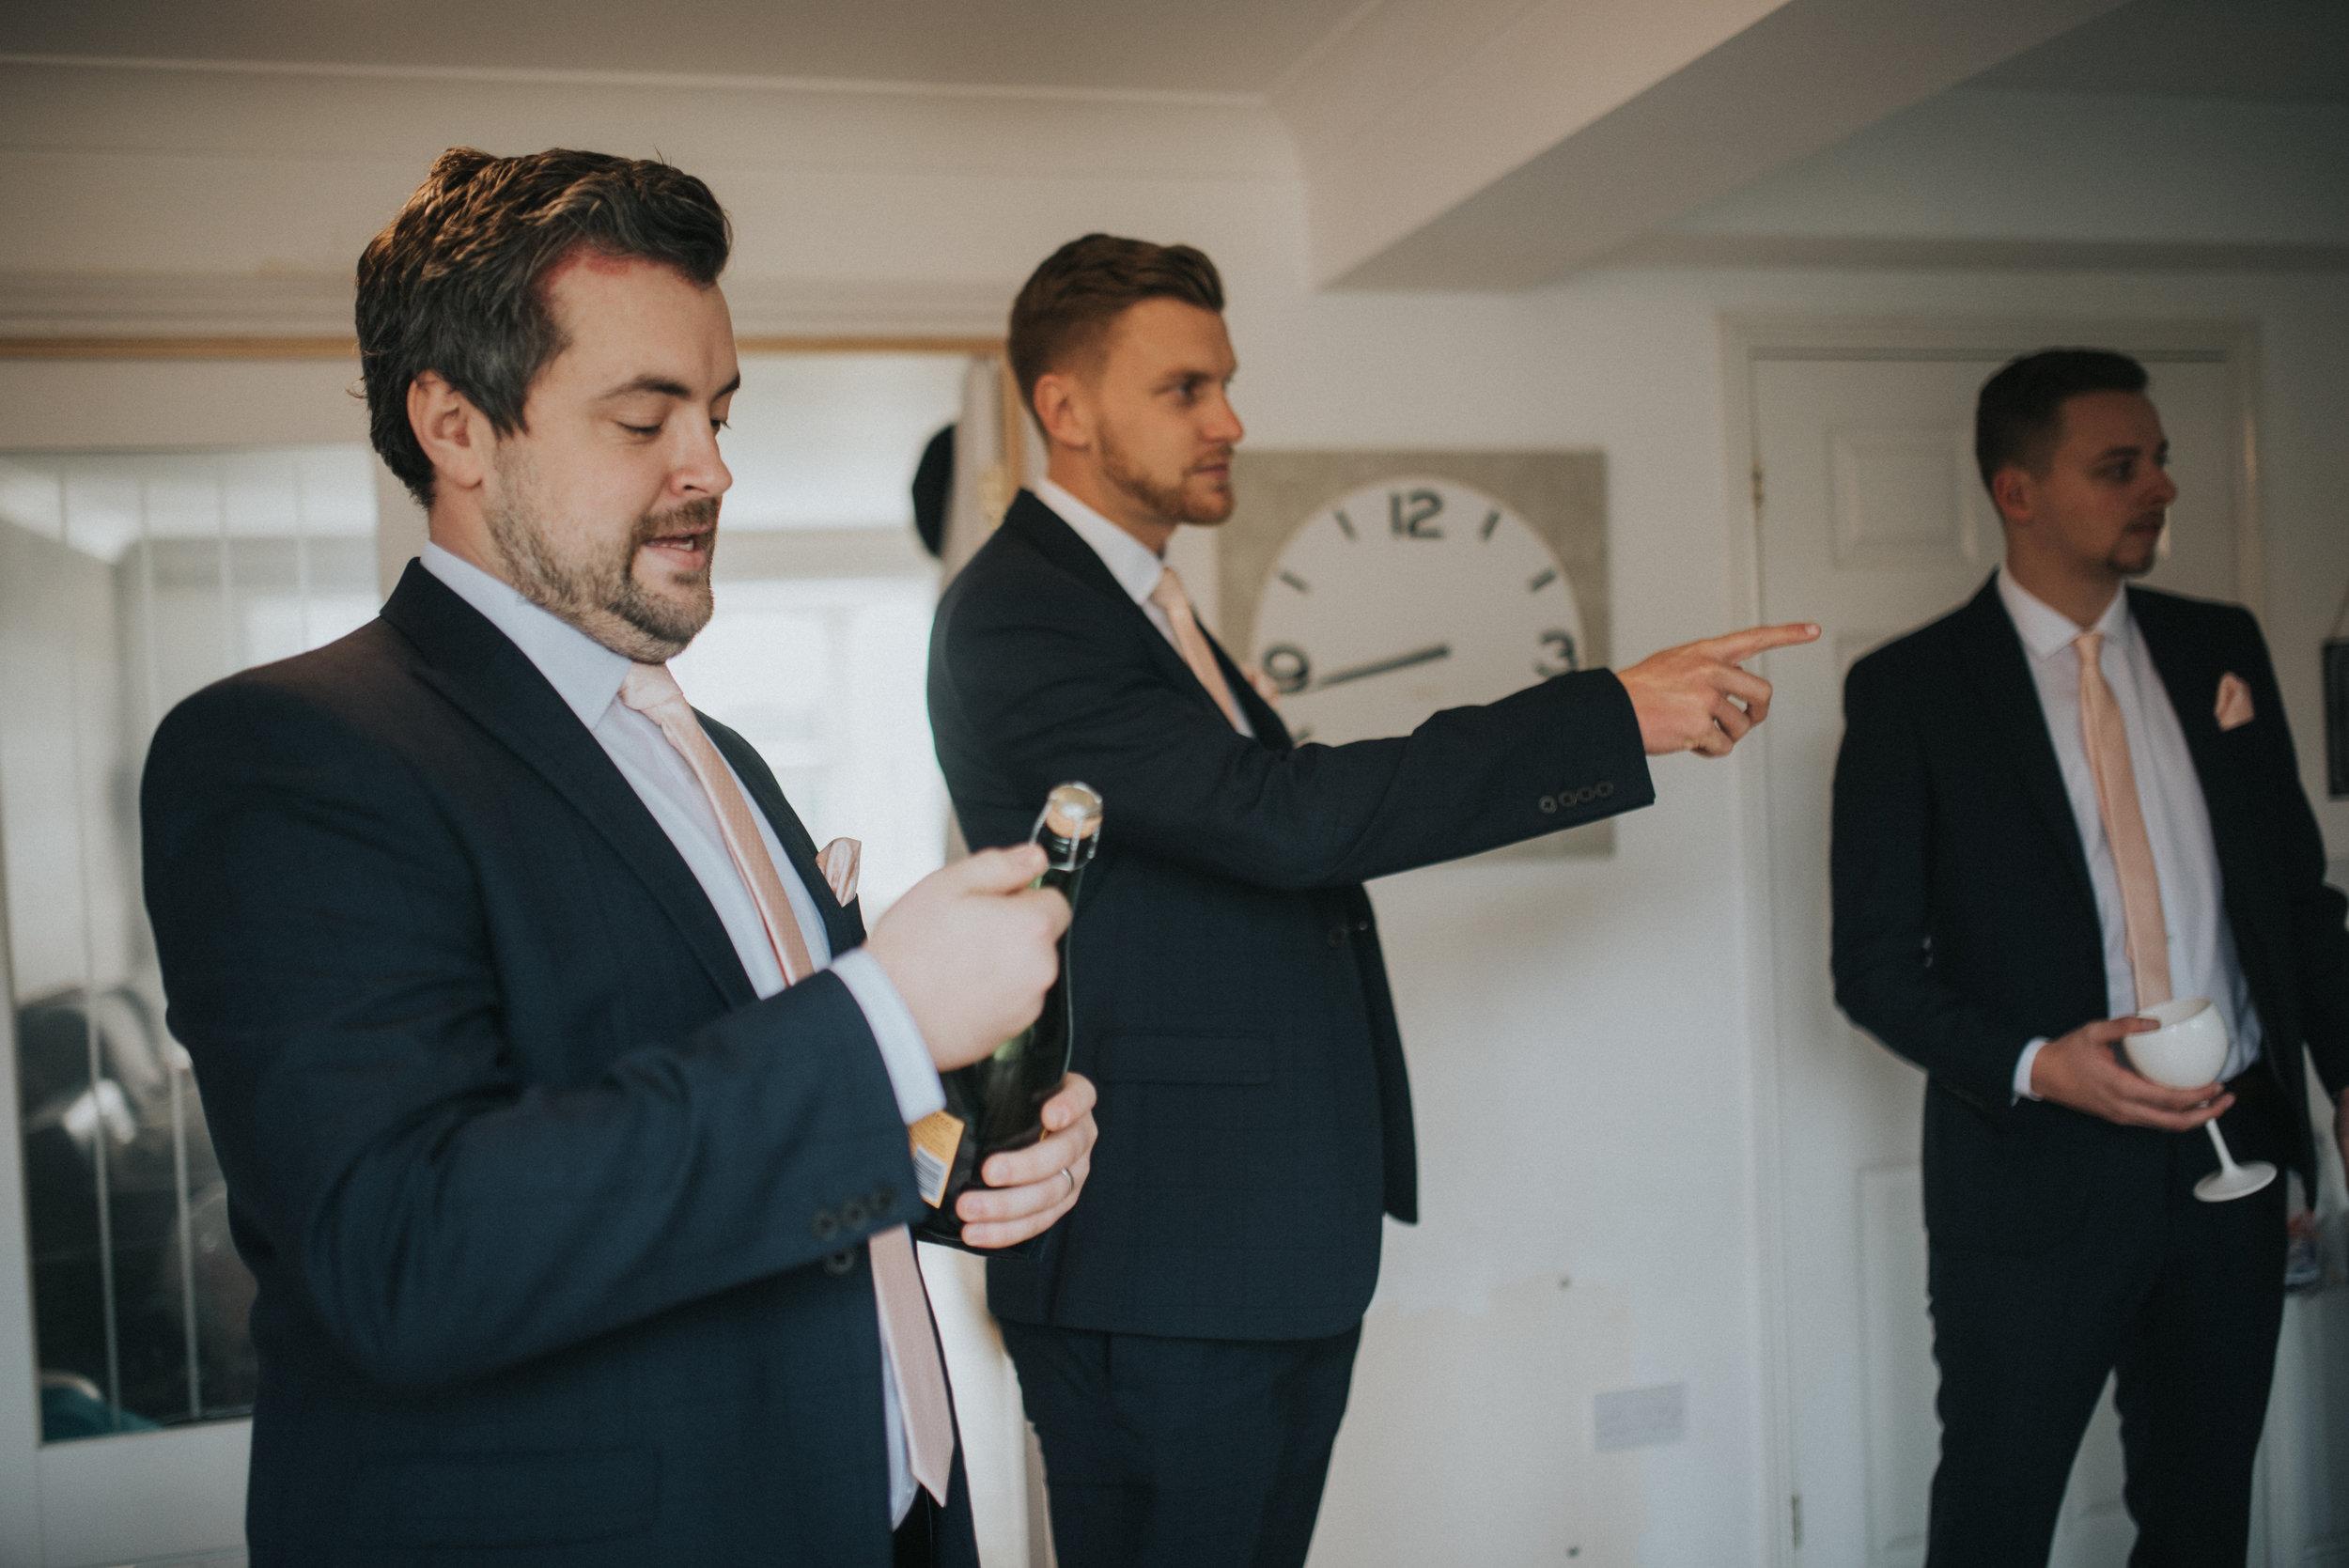 london-hertfordshire-wedding-photography-milling-barn-prep-06